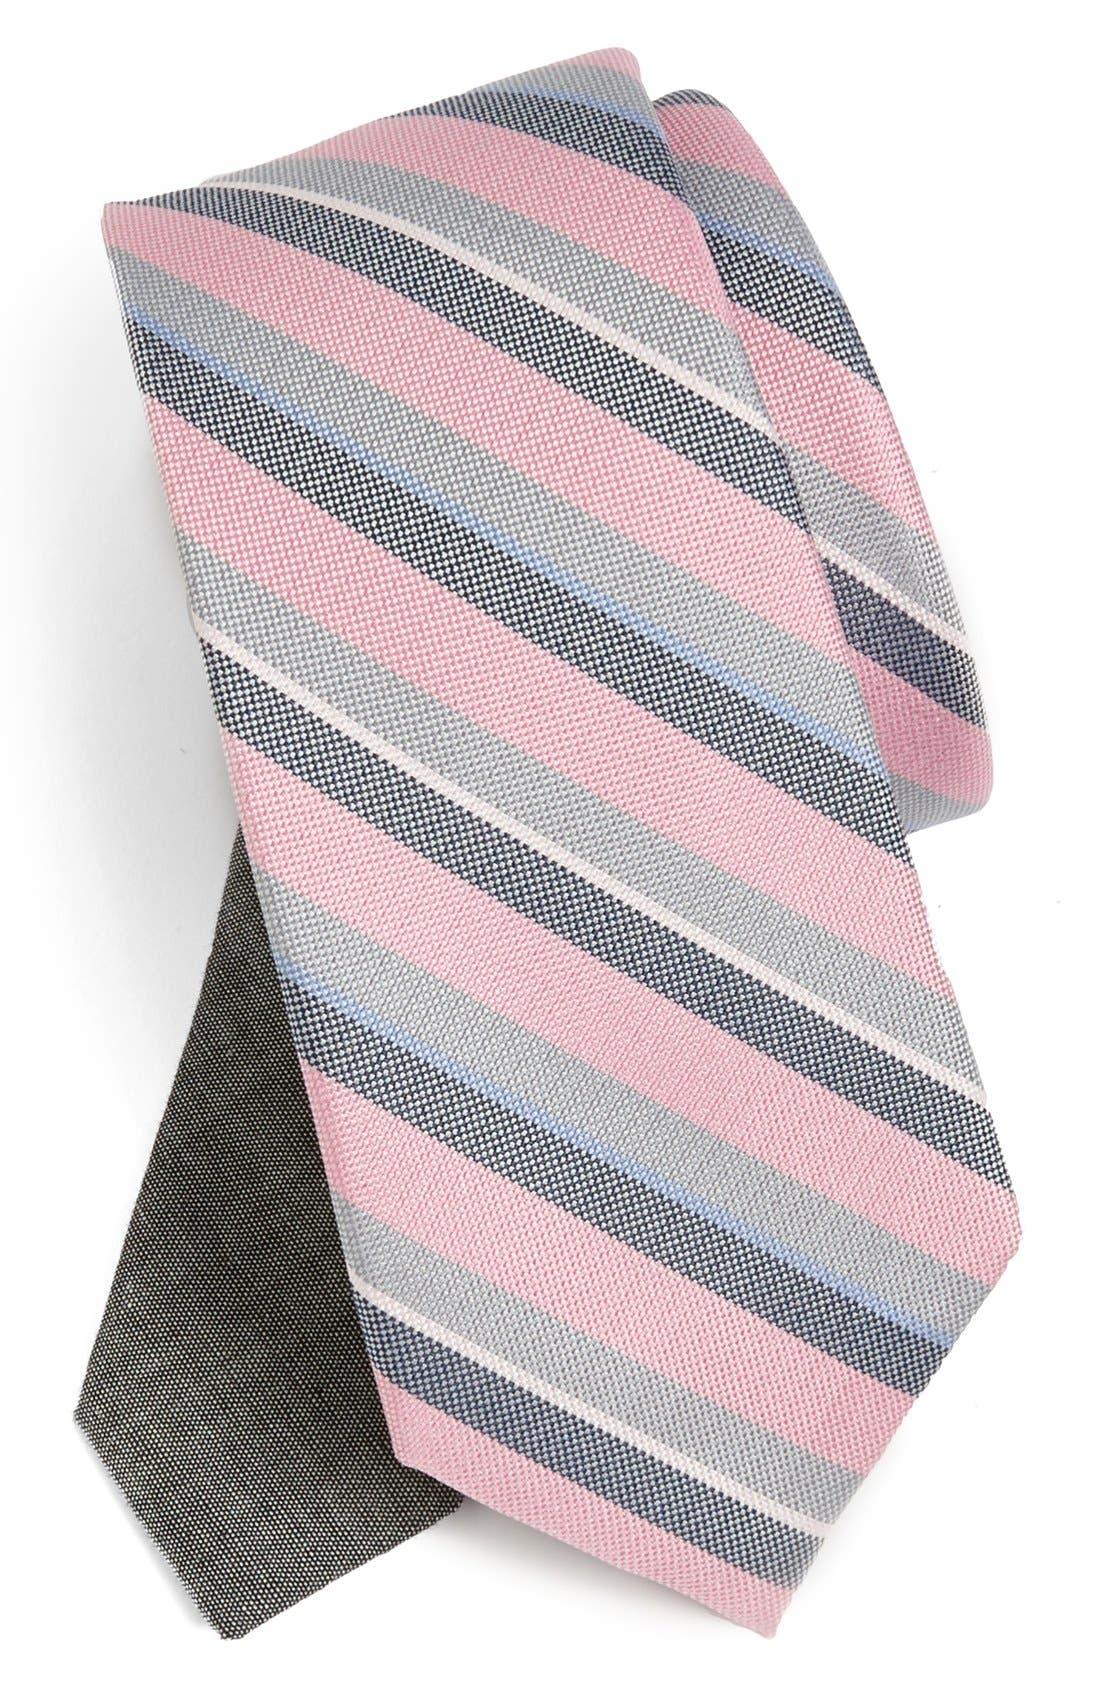 Alternate Image 1 Selected - EDIT by The Tie Bar Stripe Silk Tie (Nordstrom Exclusive)